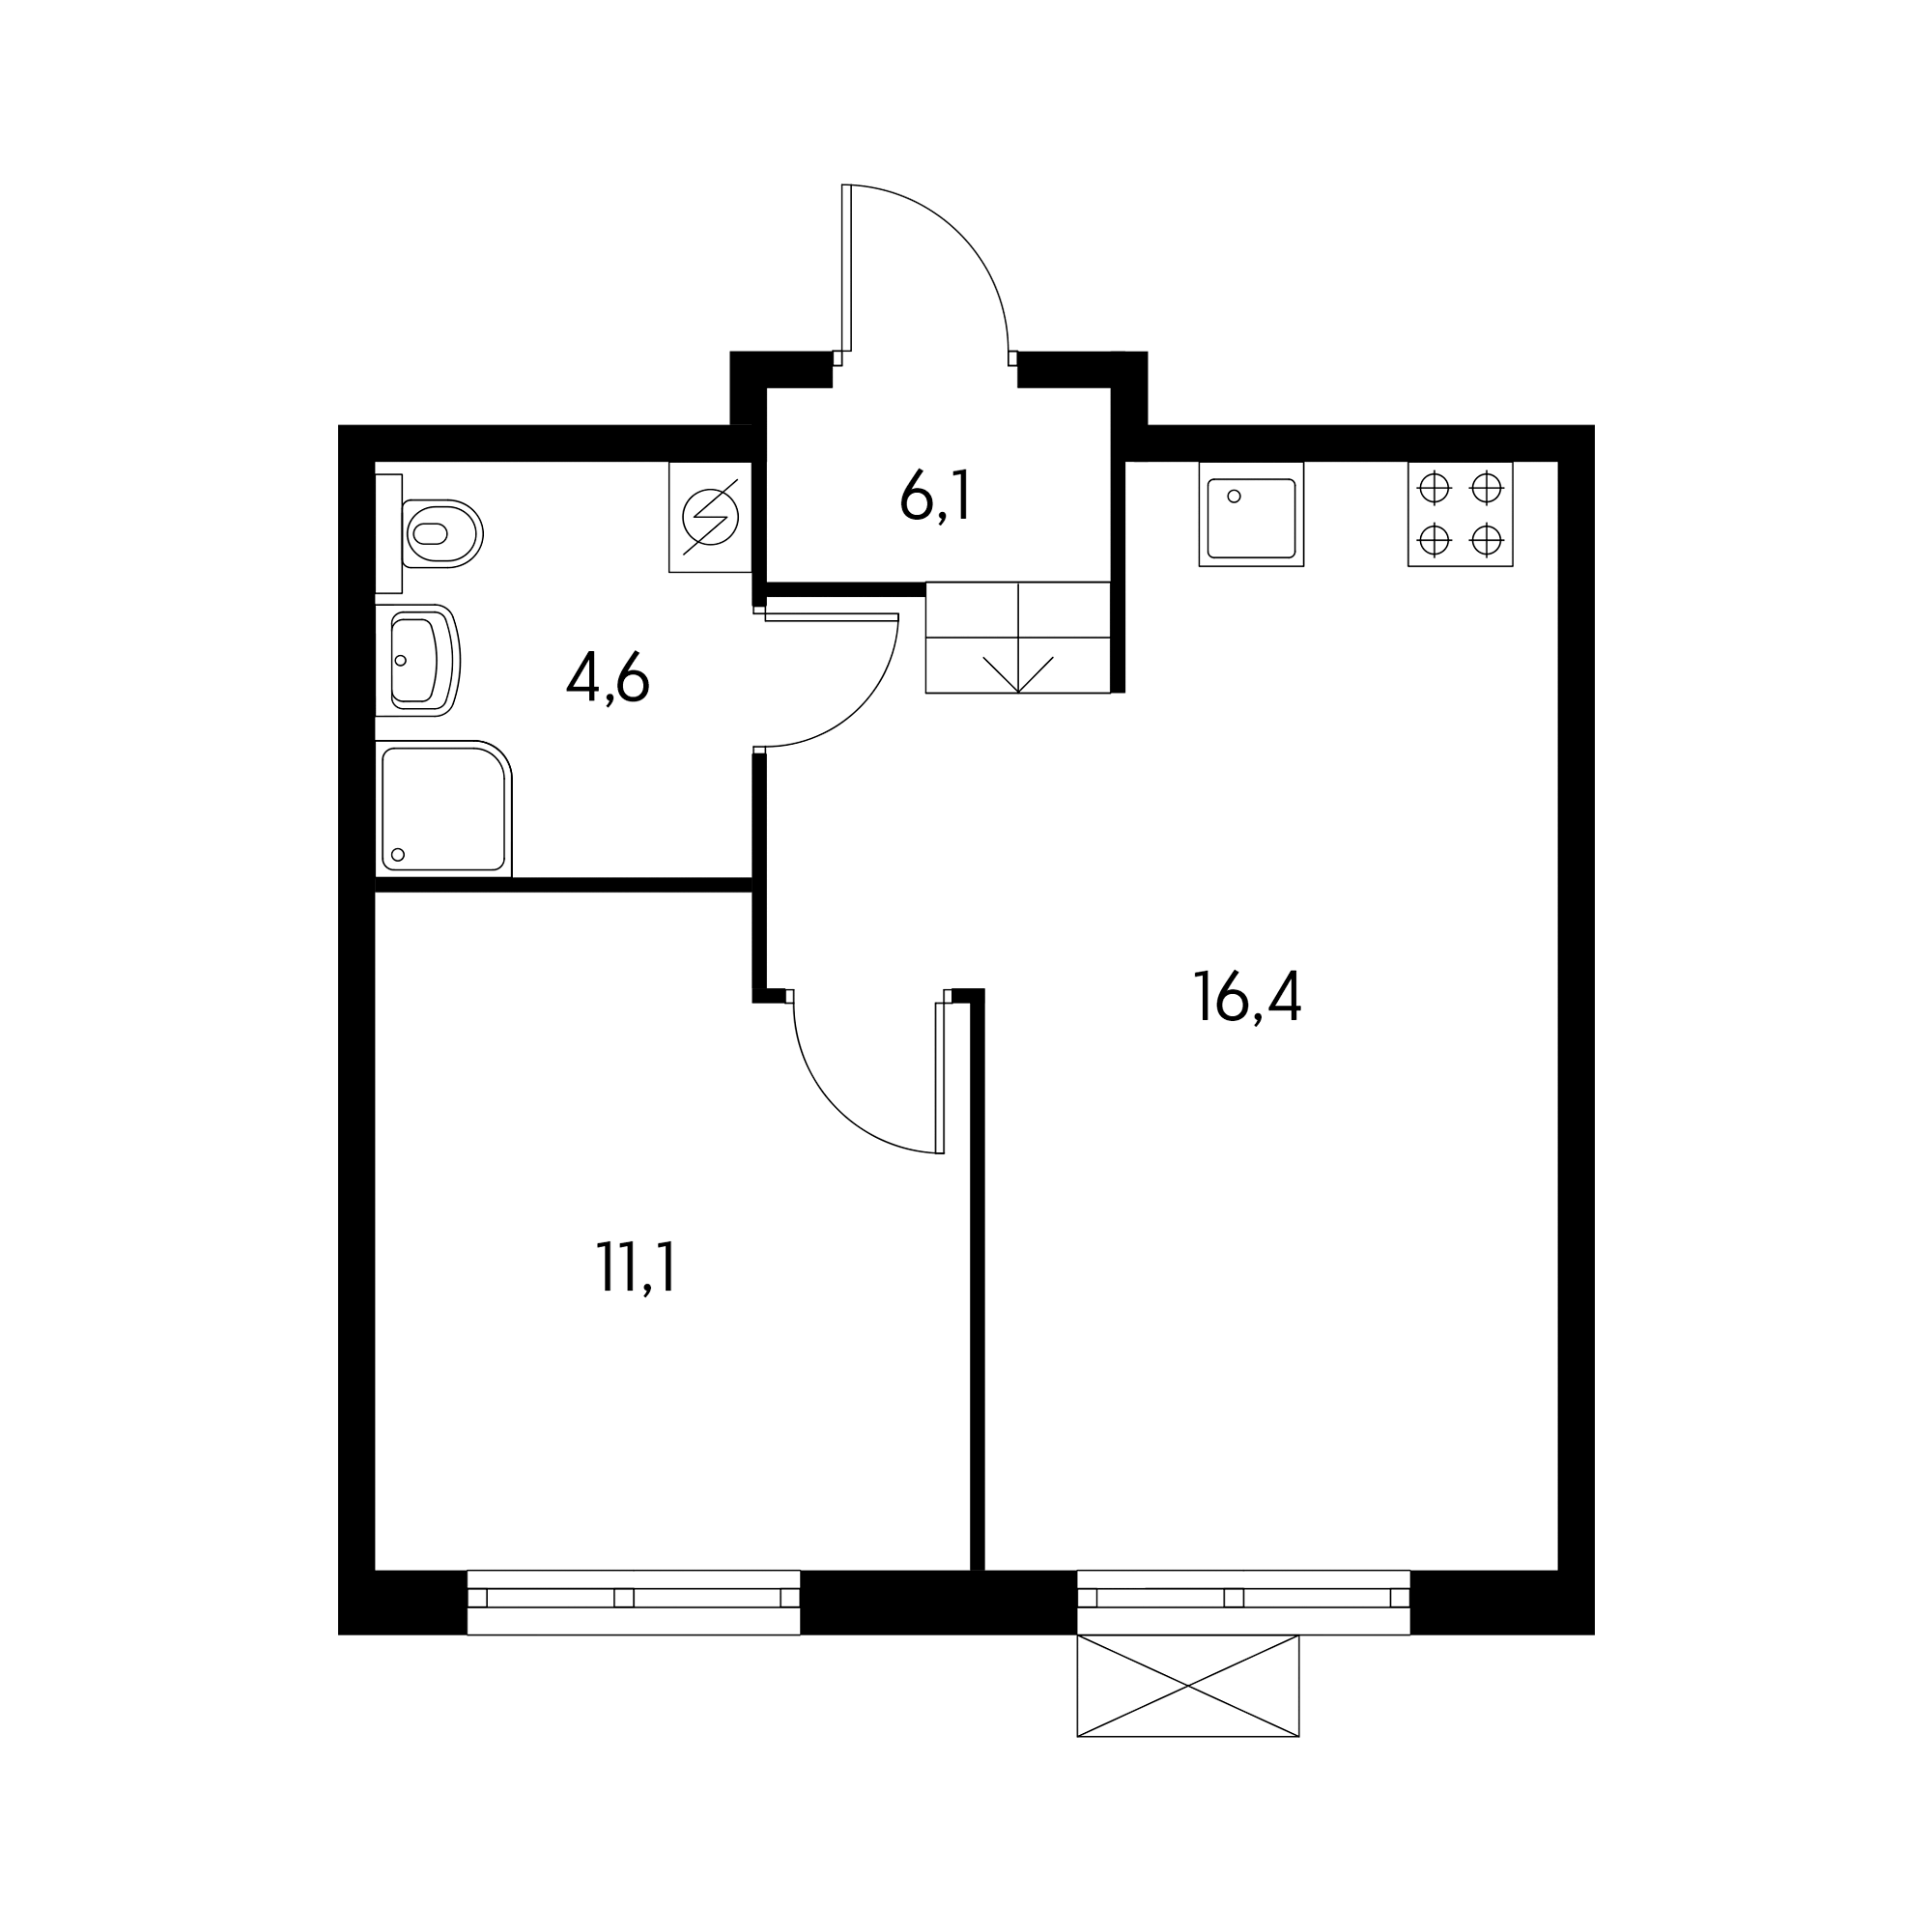 1-1_1(3)